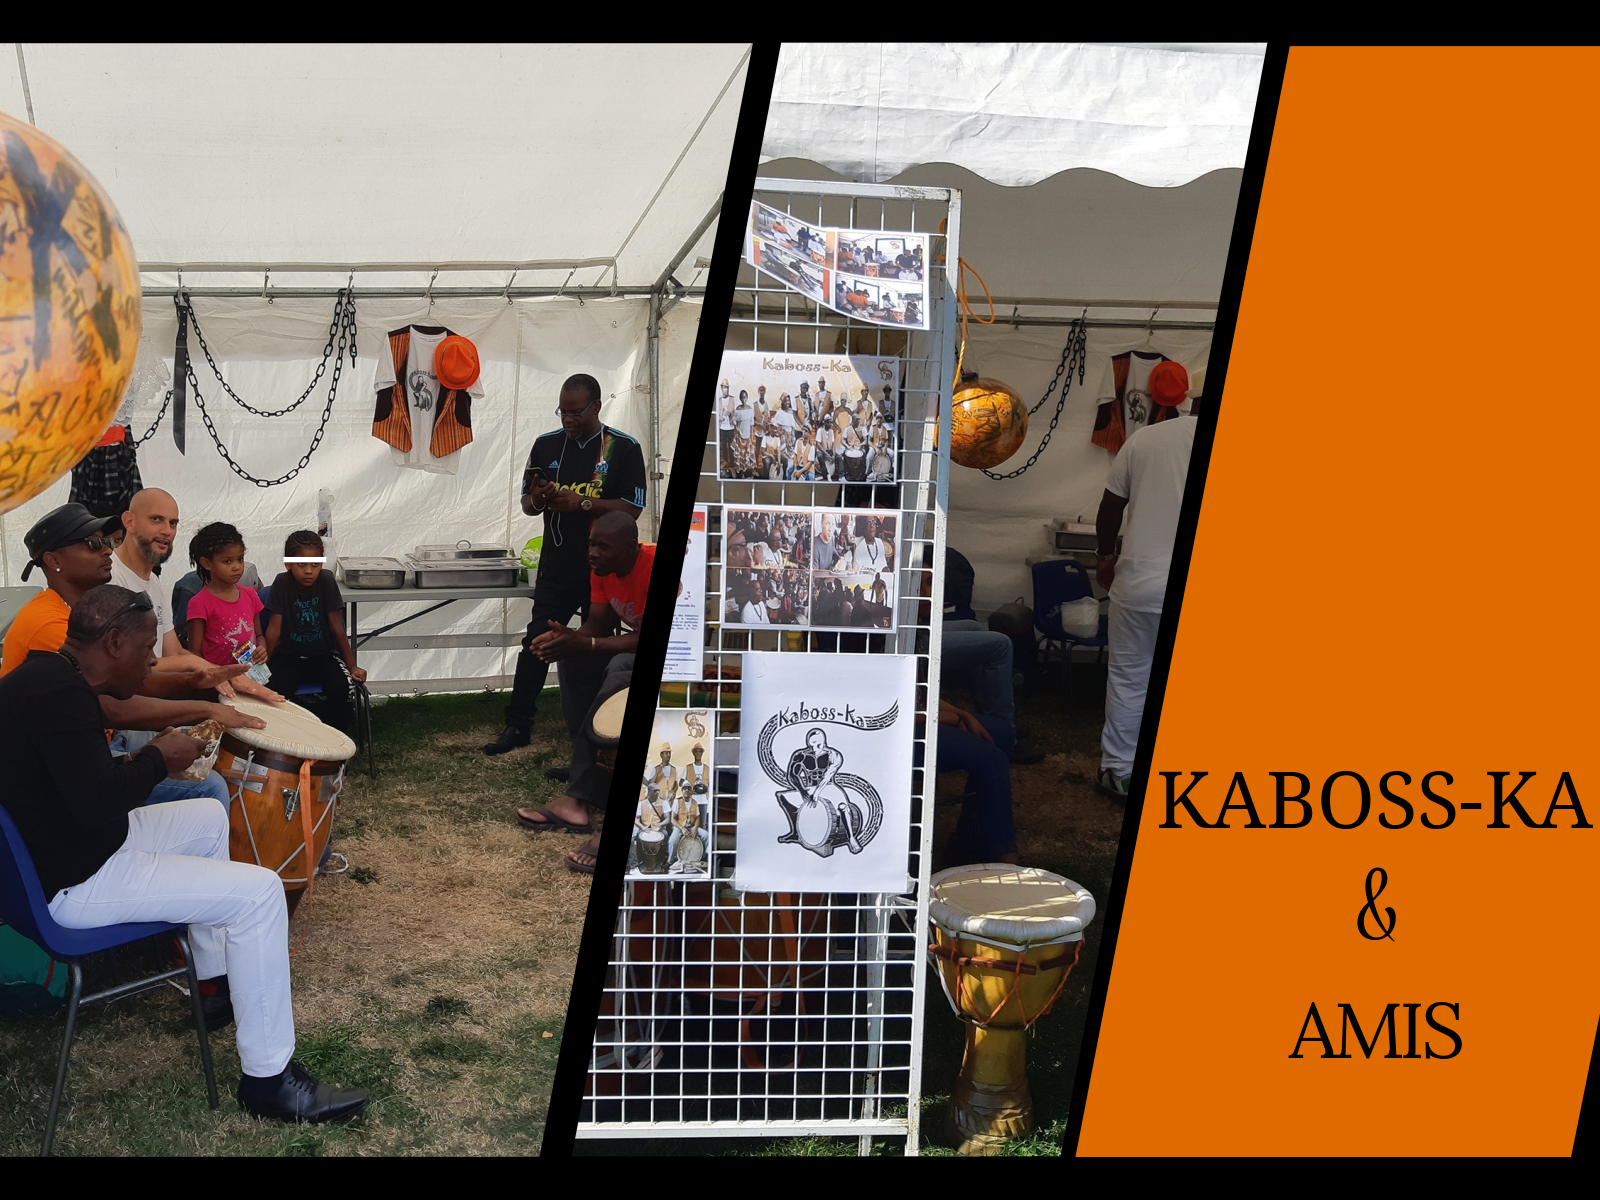 KABOSS-KA et AMIS 6